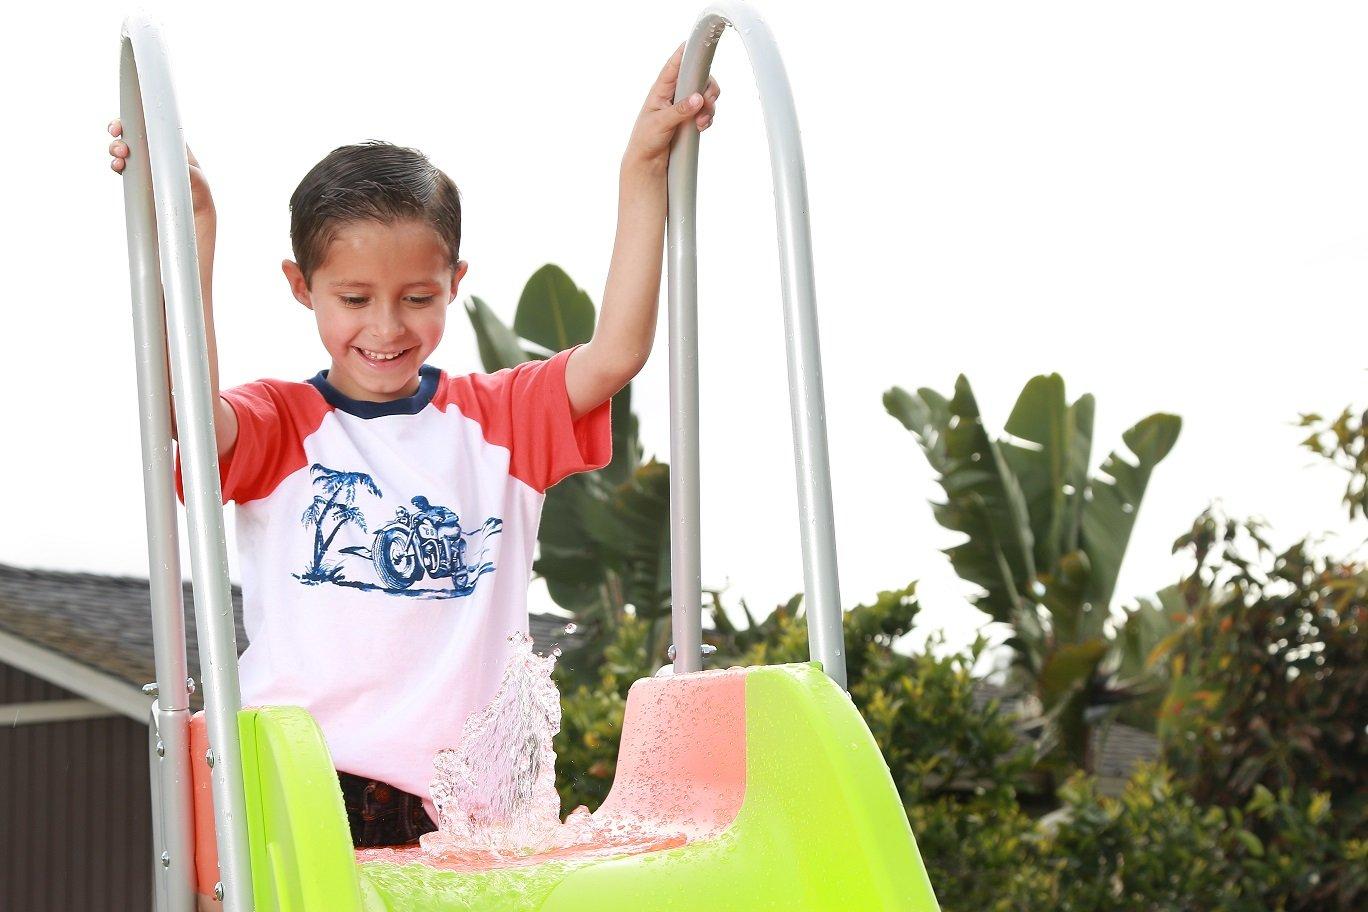 SLIDEWHIZZER Outdoor Play Set Kids Slide: 10 ft Freestanding Climber, Swingsets, Playground Jungle Gyms Kids Love - Above Ground Pool Slide for Summer Backyard by SLIDEWHIZZER (Image #2)